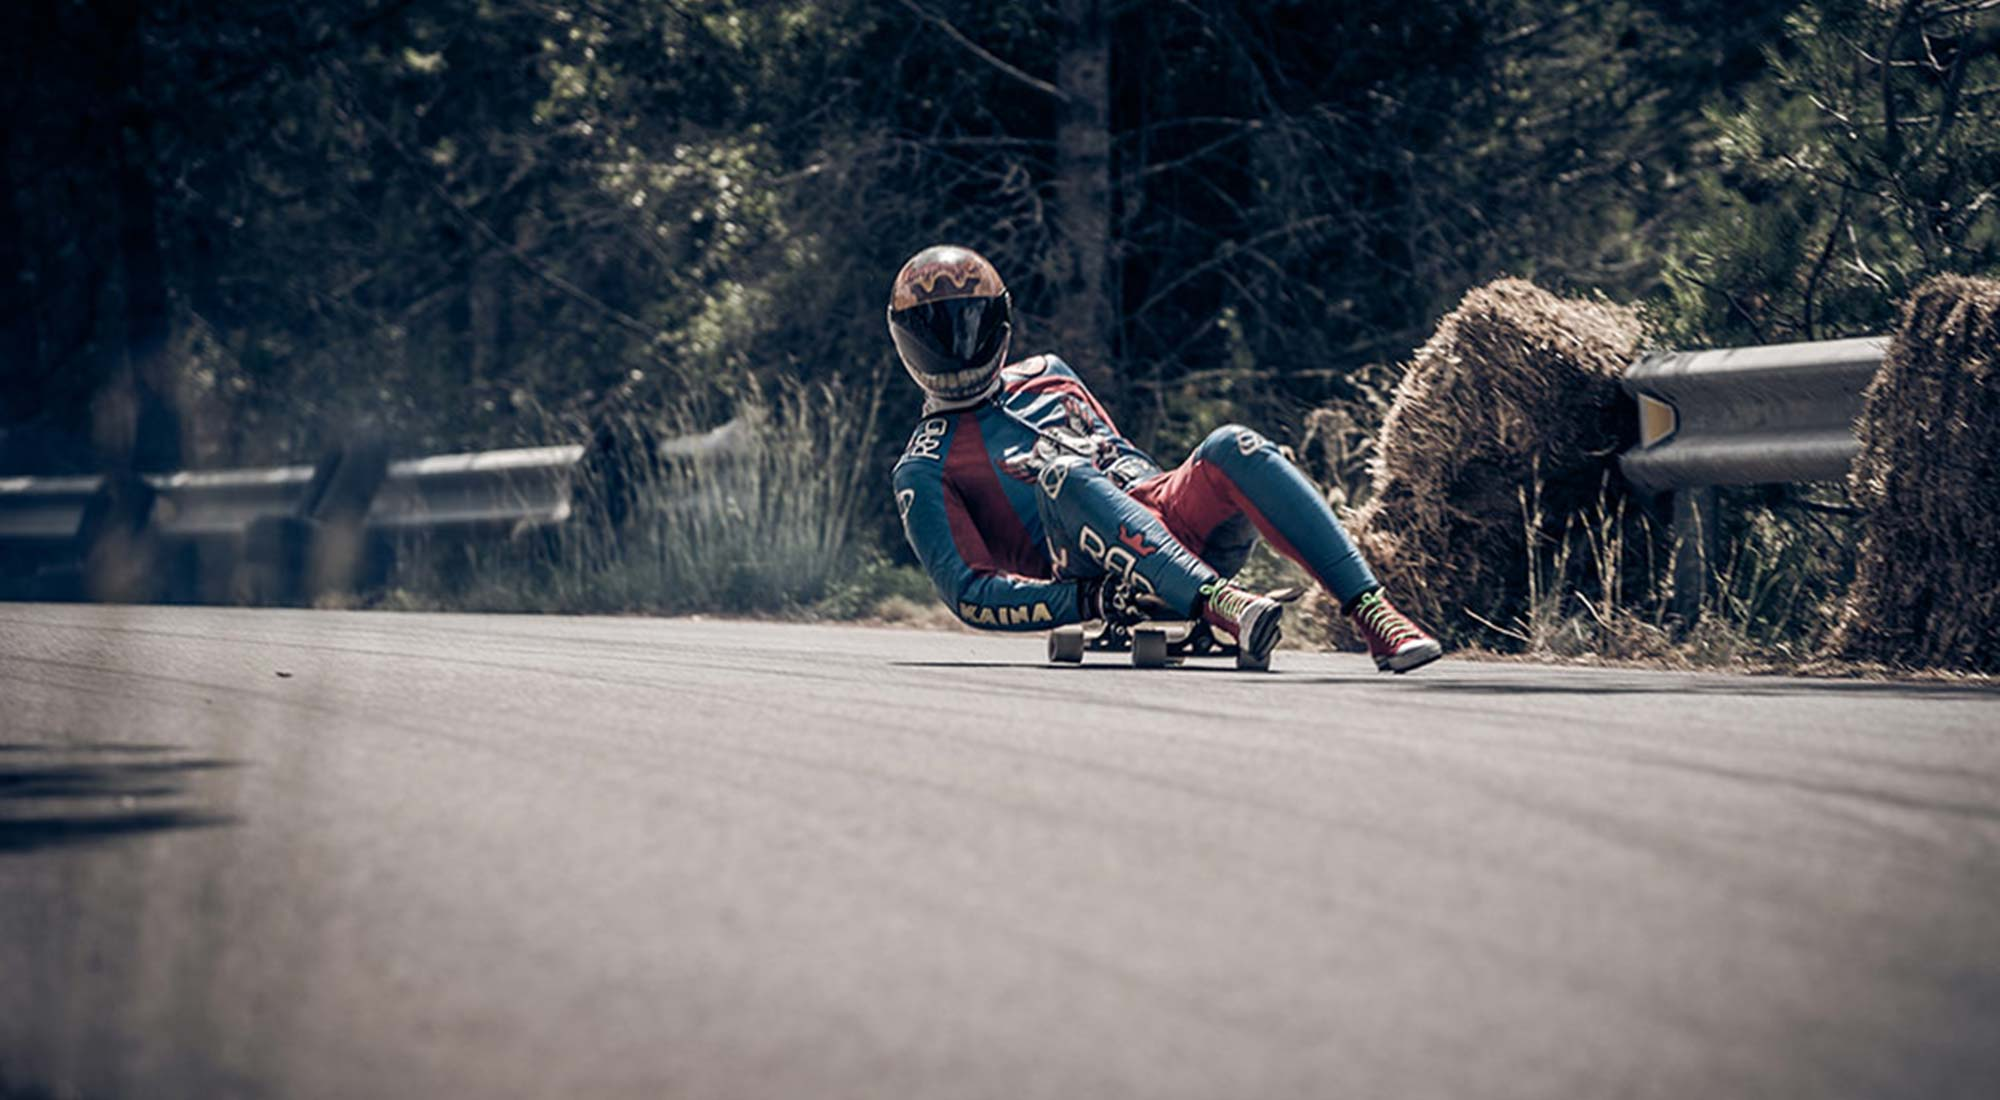 mikel echegaray downhill buttboard bamboo hare